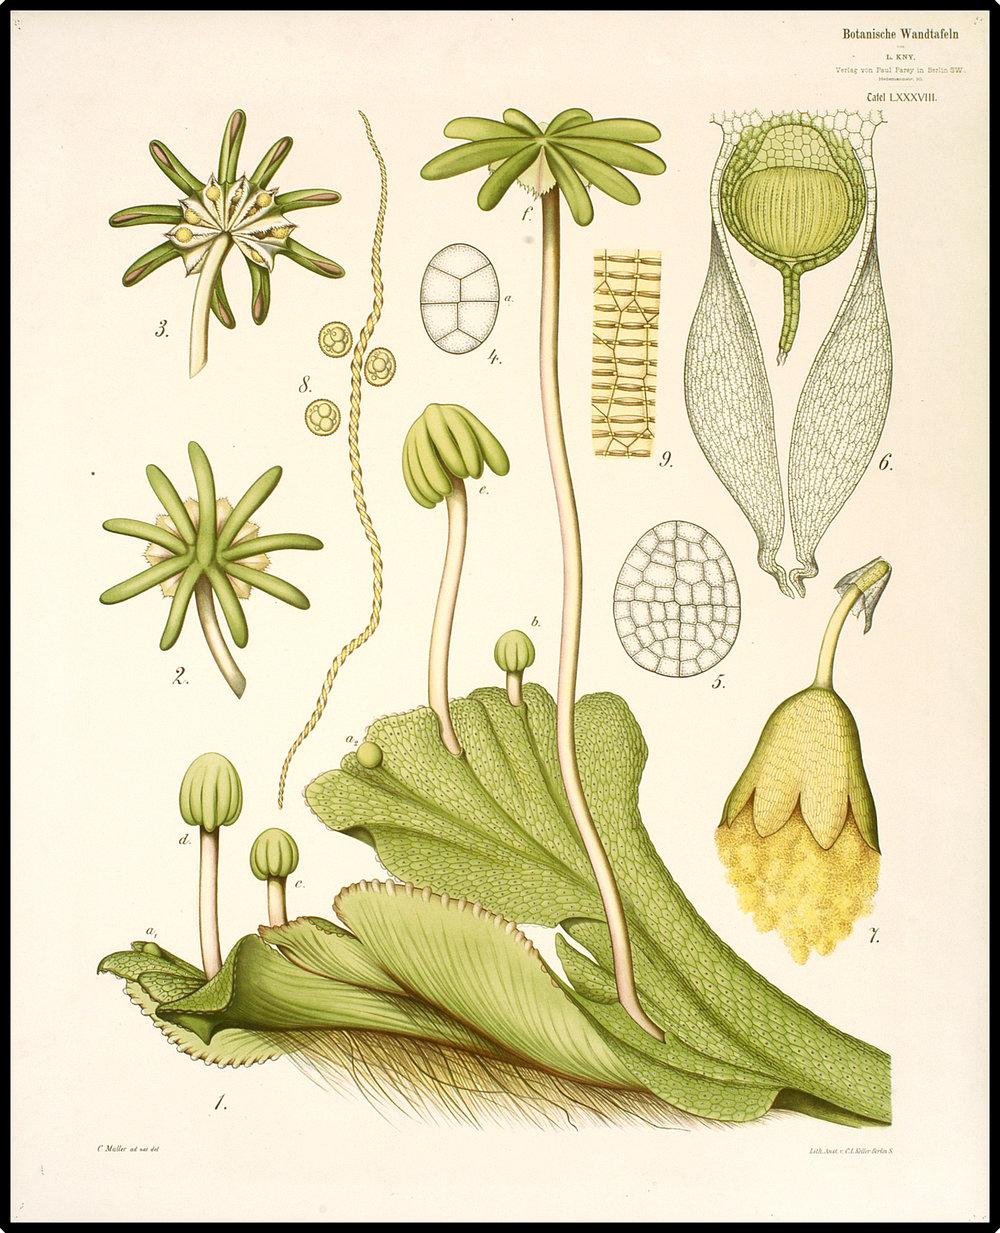 Female gametangia and sporangia